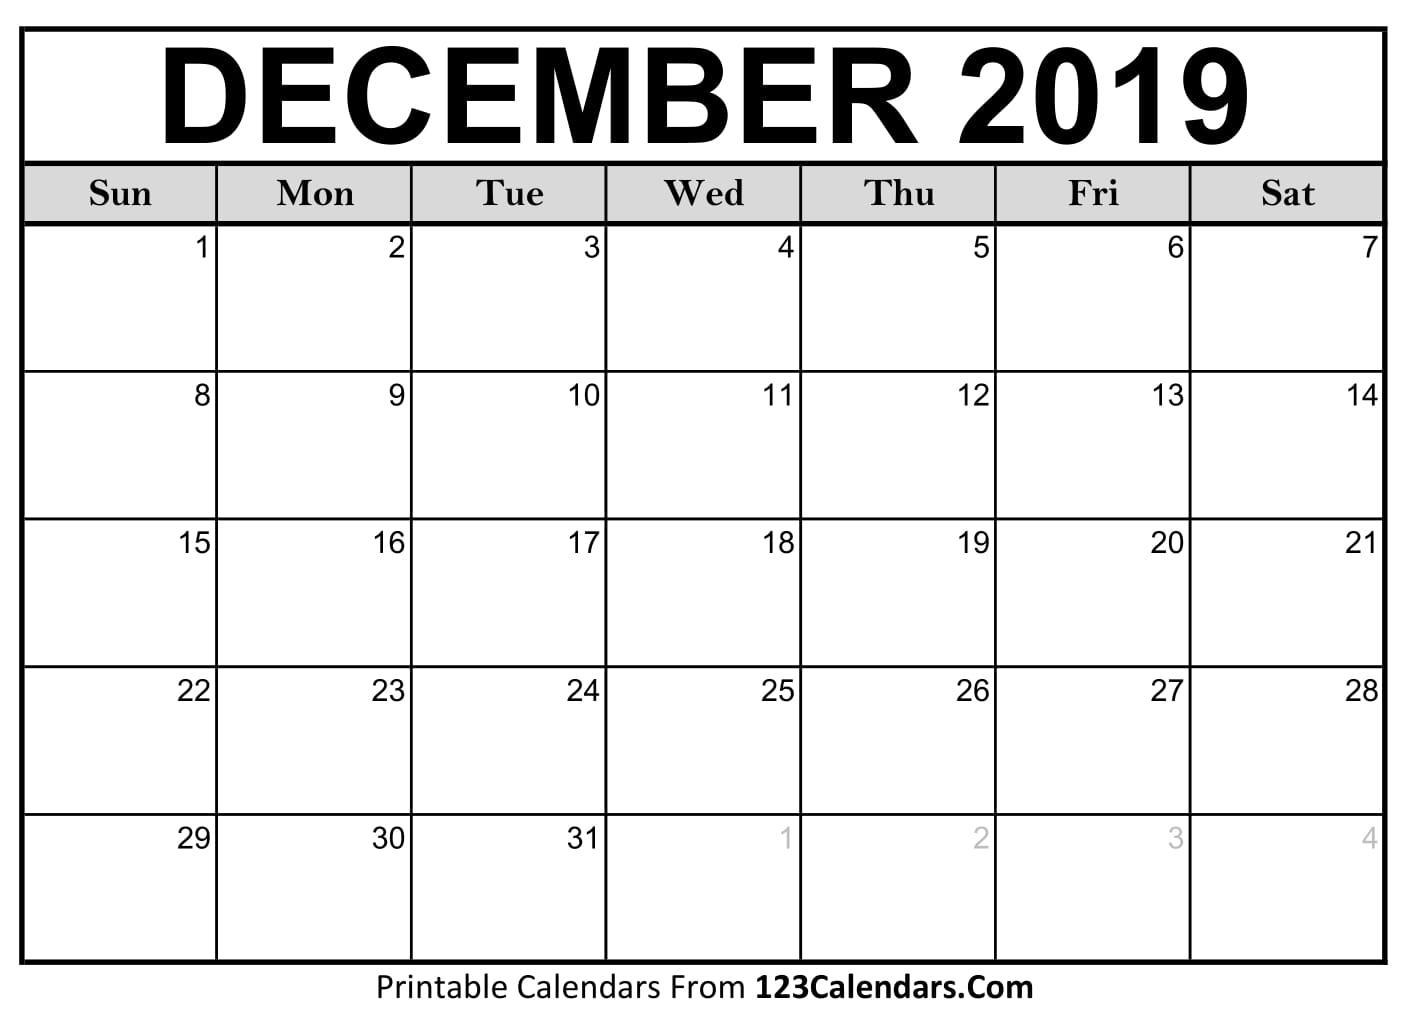 December 2019 Printable Calendar | 123Calendars